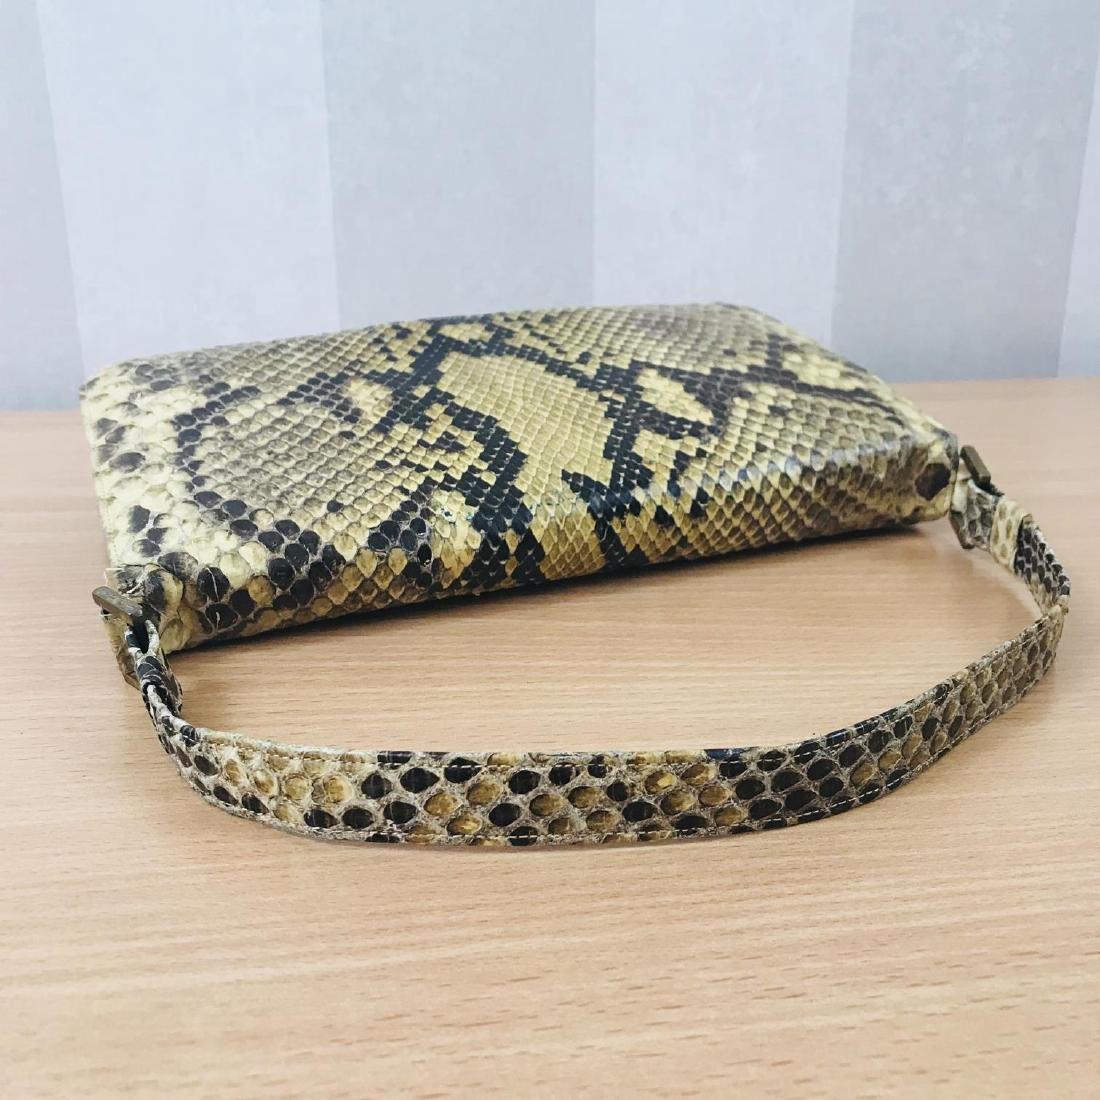 Vintage Snakeskin Leather Handbag - 6